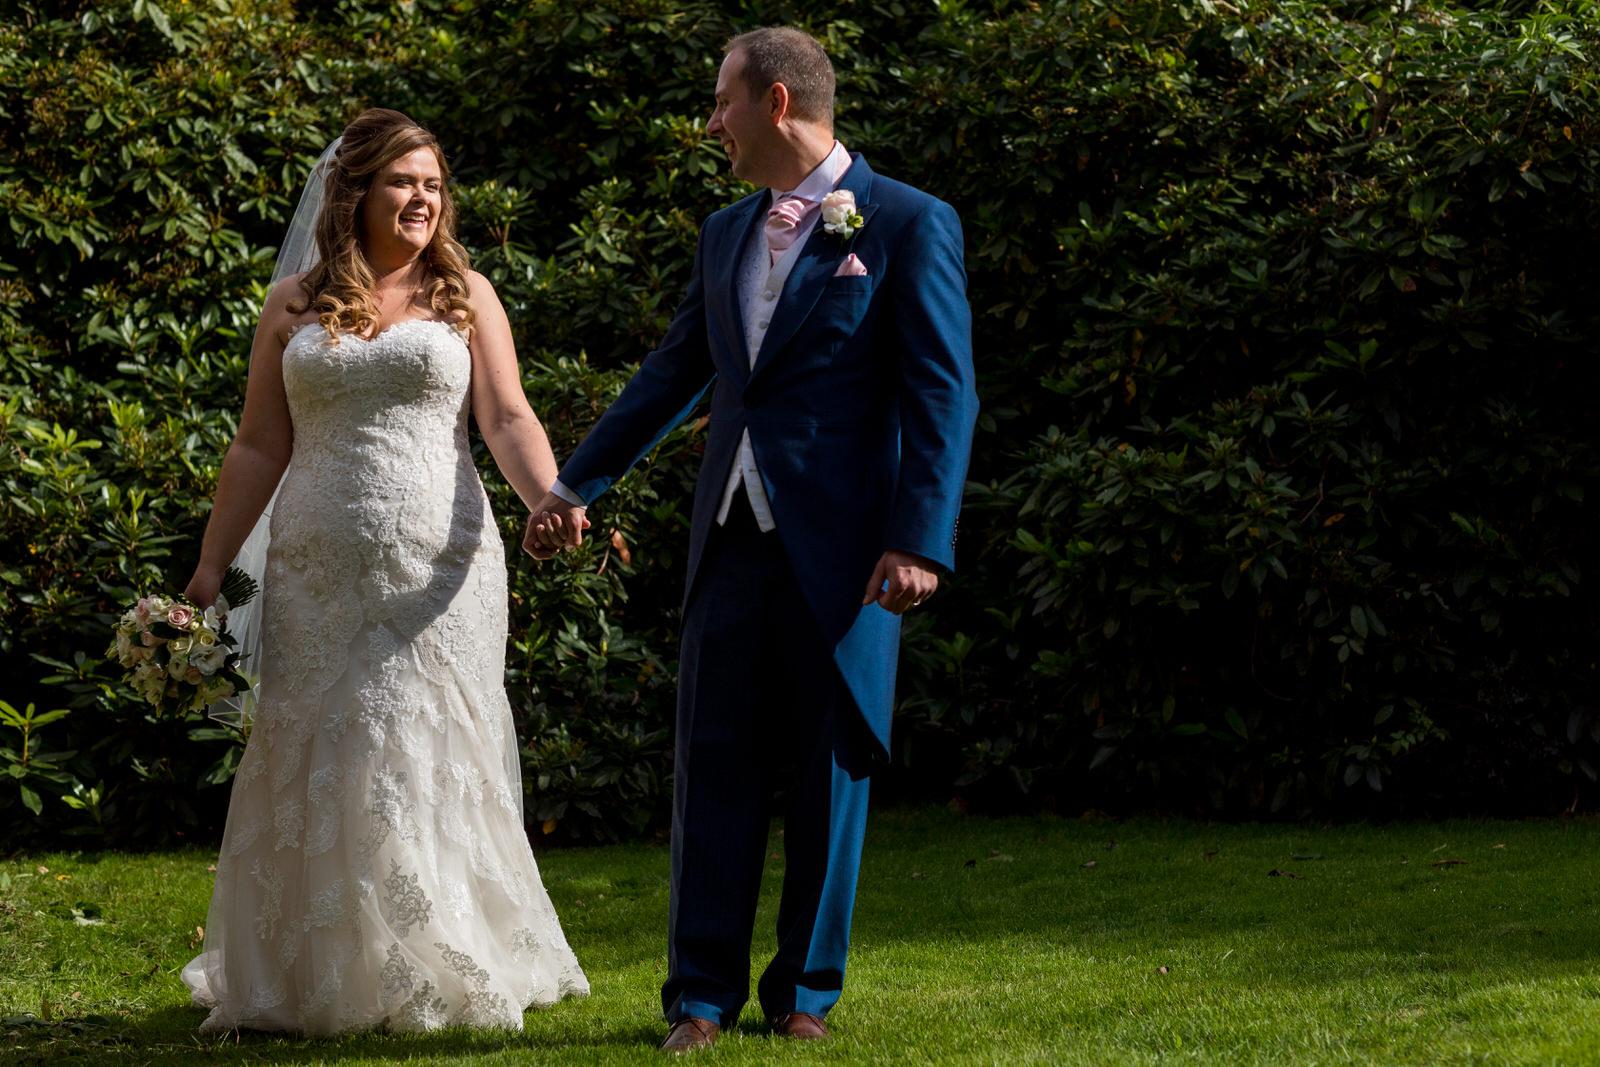 Home counties wedding photography by Damion Mower on English-Wedding.com (2)